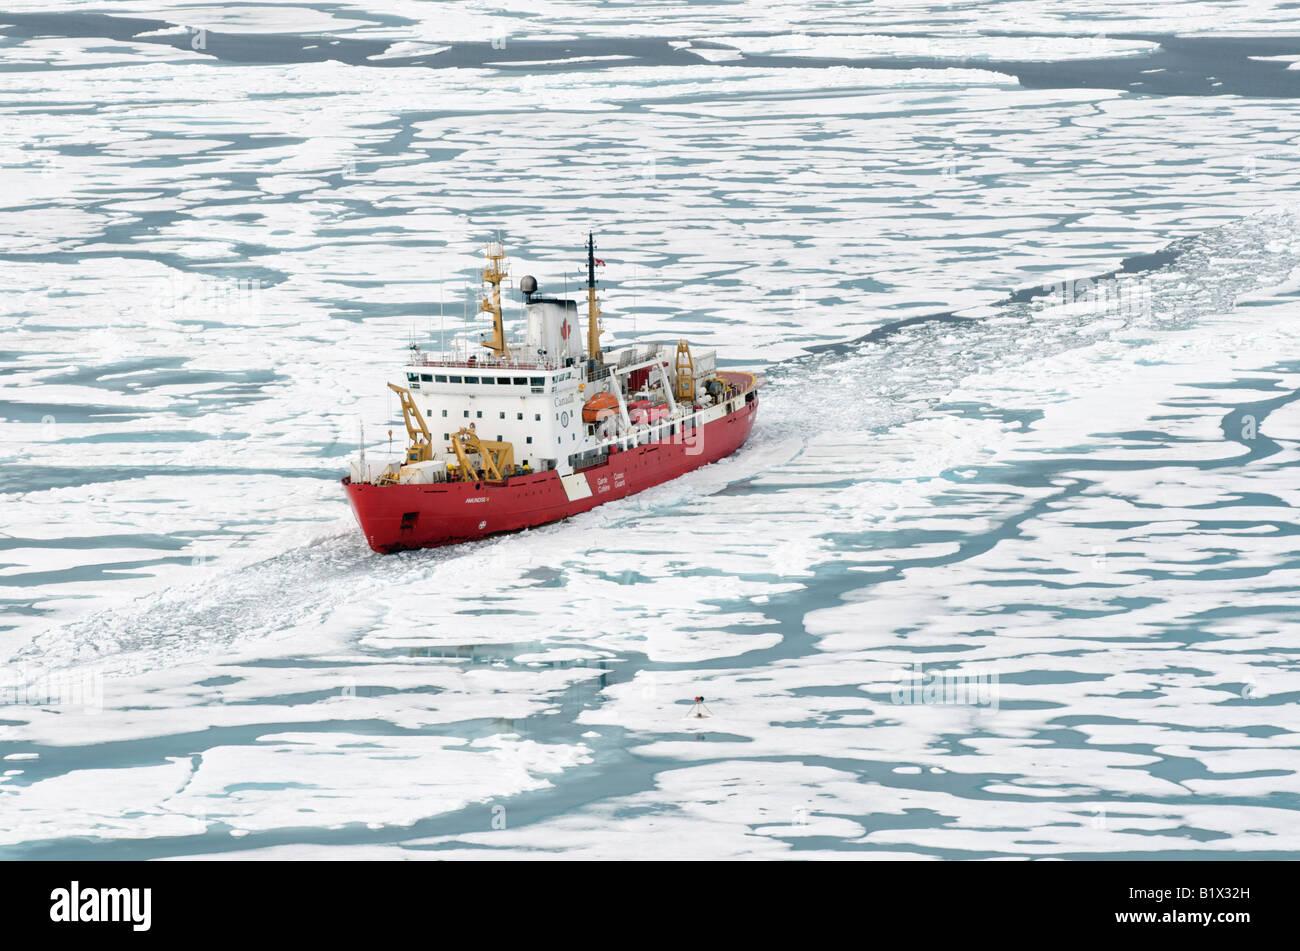 Image result for arctic icebreaker ship